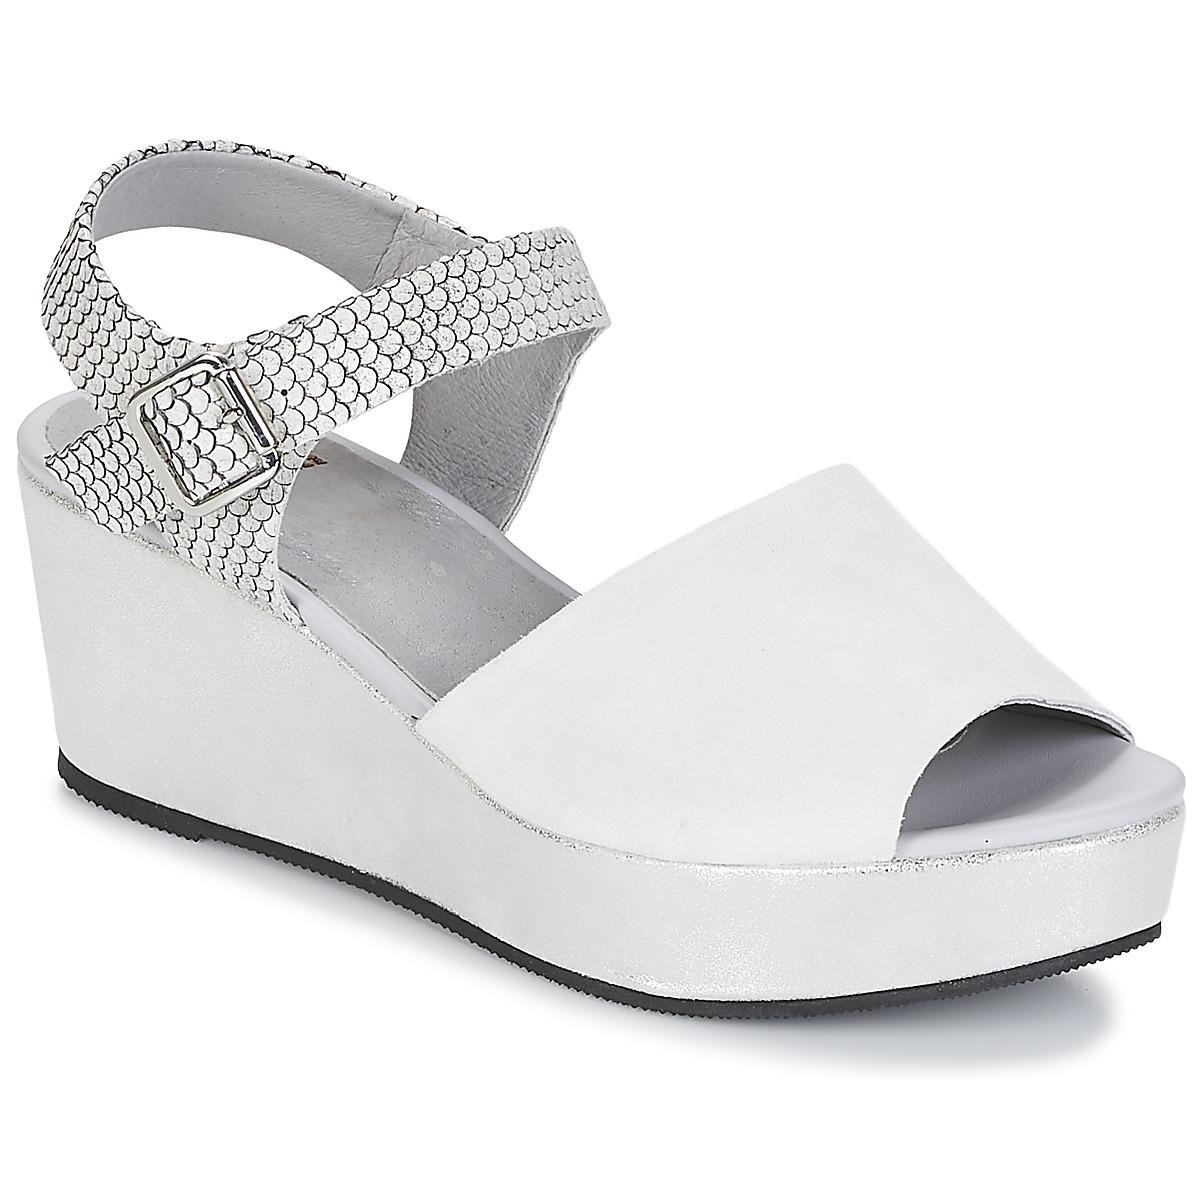 MamZelle LAKALA Taupe Shoes Hi top trainers Women KsteXoH2